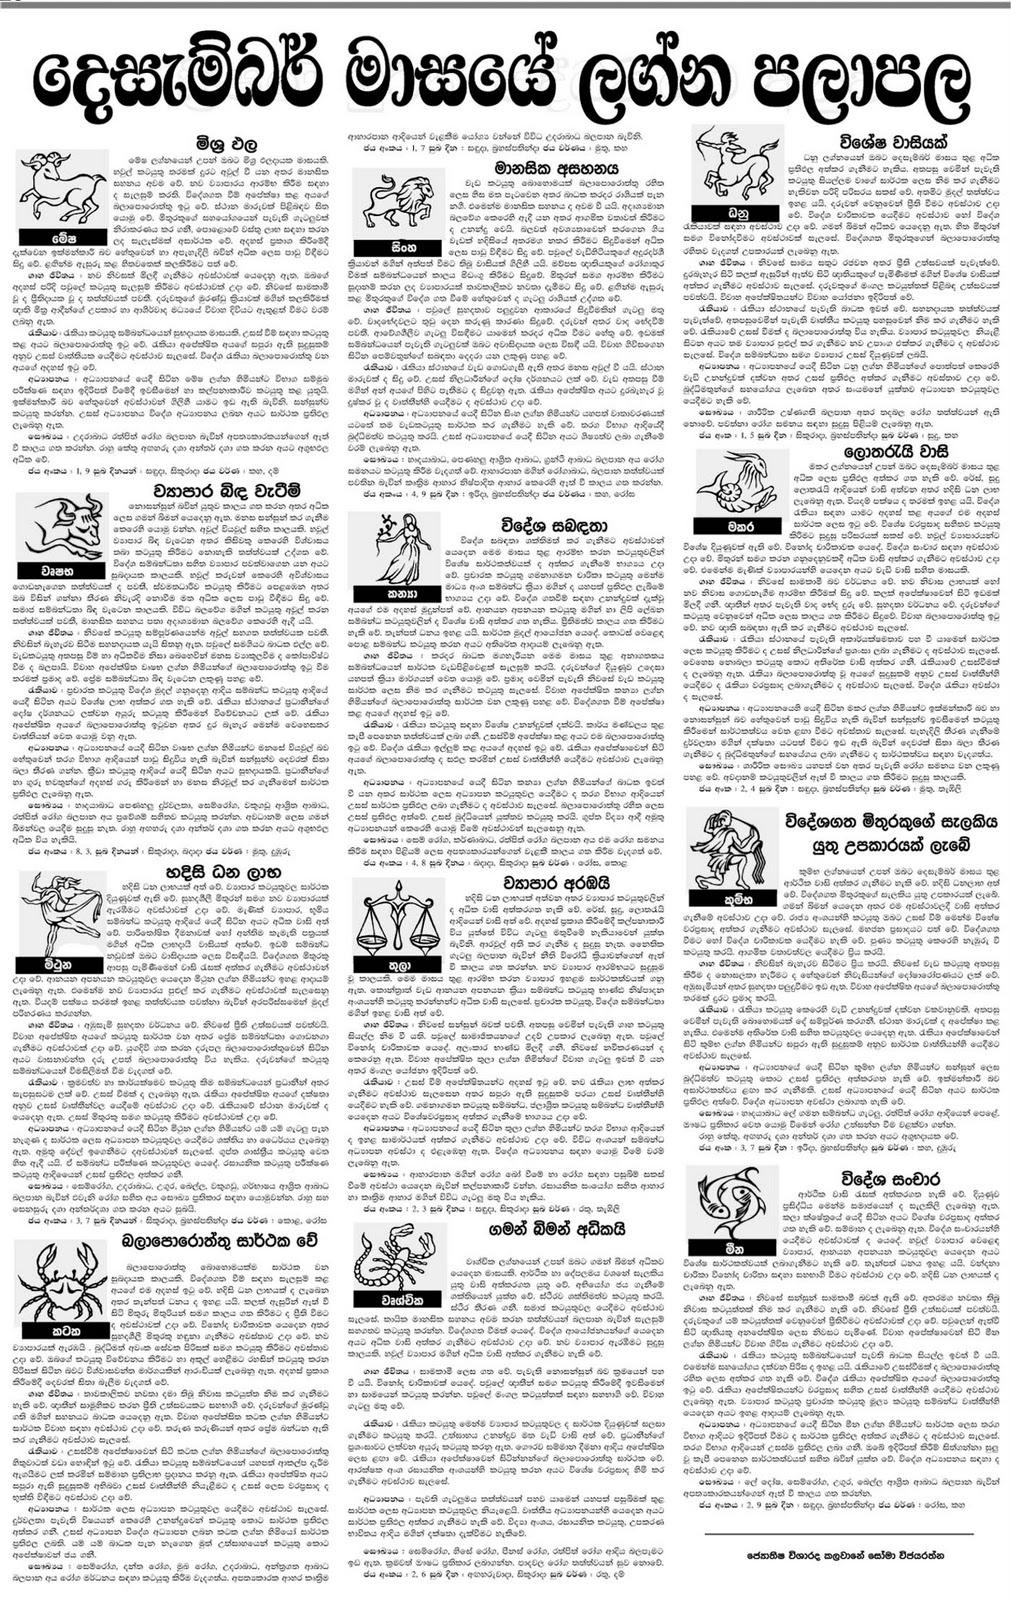 Lagna Palapala 2016 Sinhala Hindu New Year | Calendar Template 2016